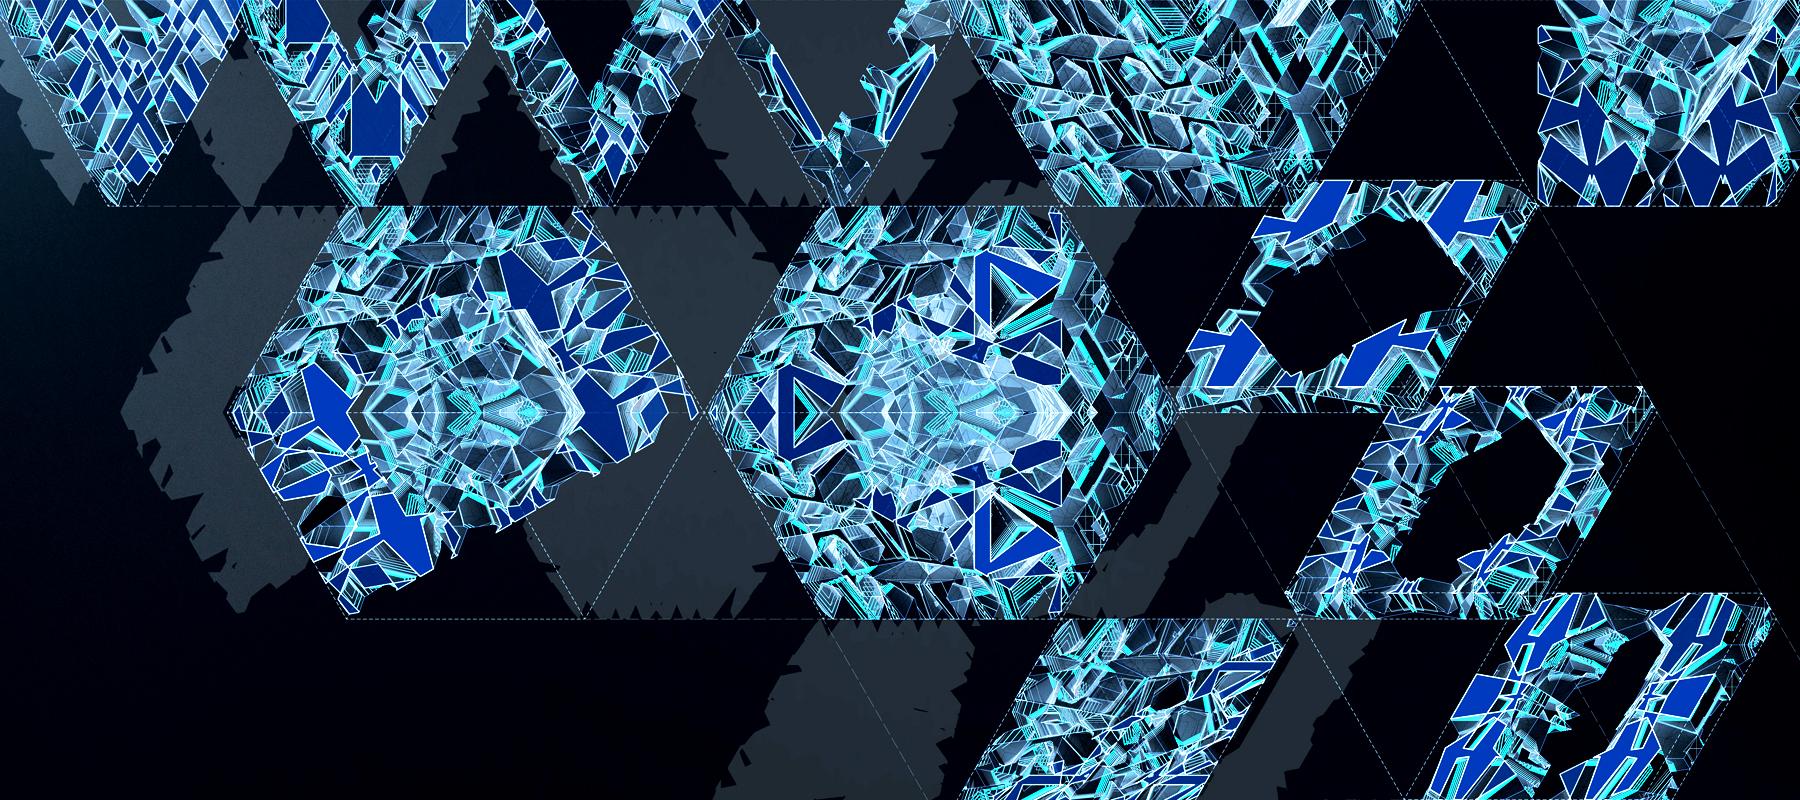 explodediso2.jpg